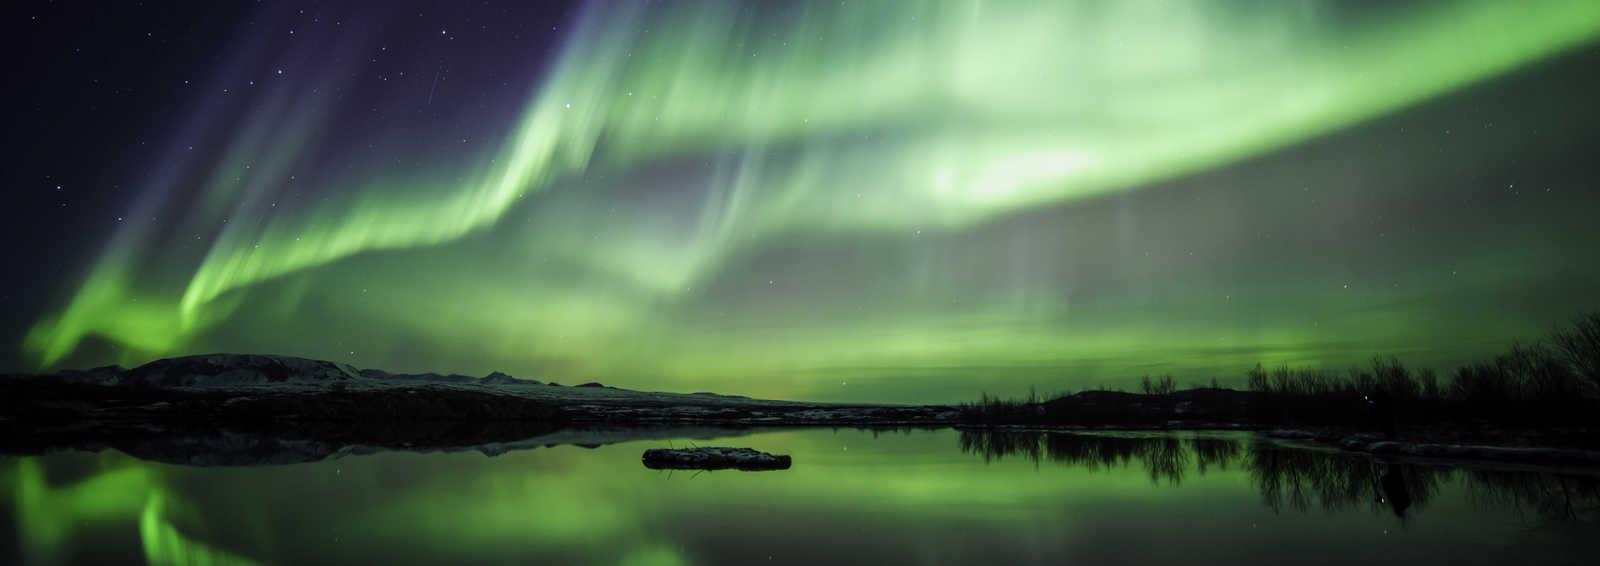 Northern lights (Aurora Borealis) over Iceland